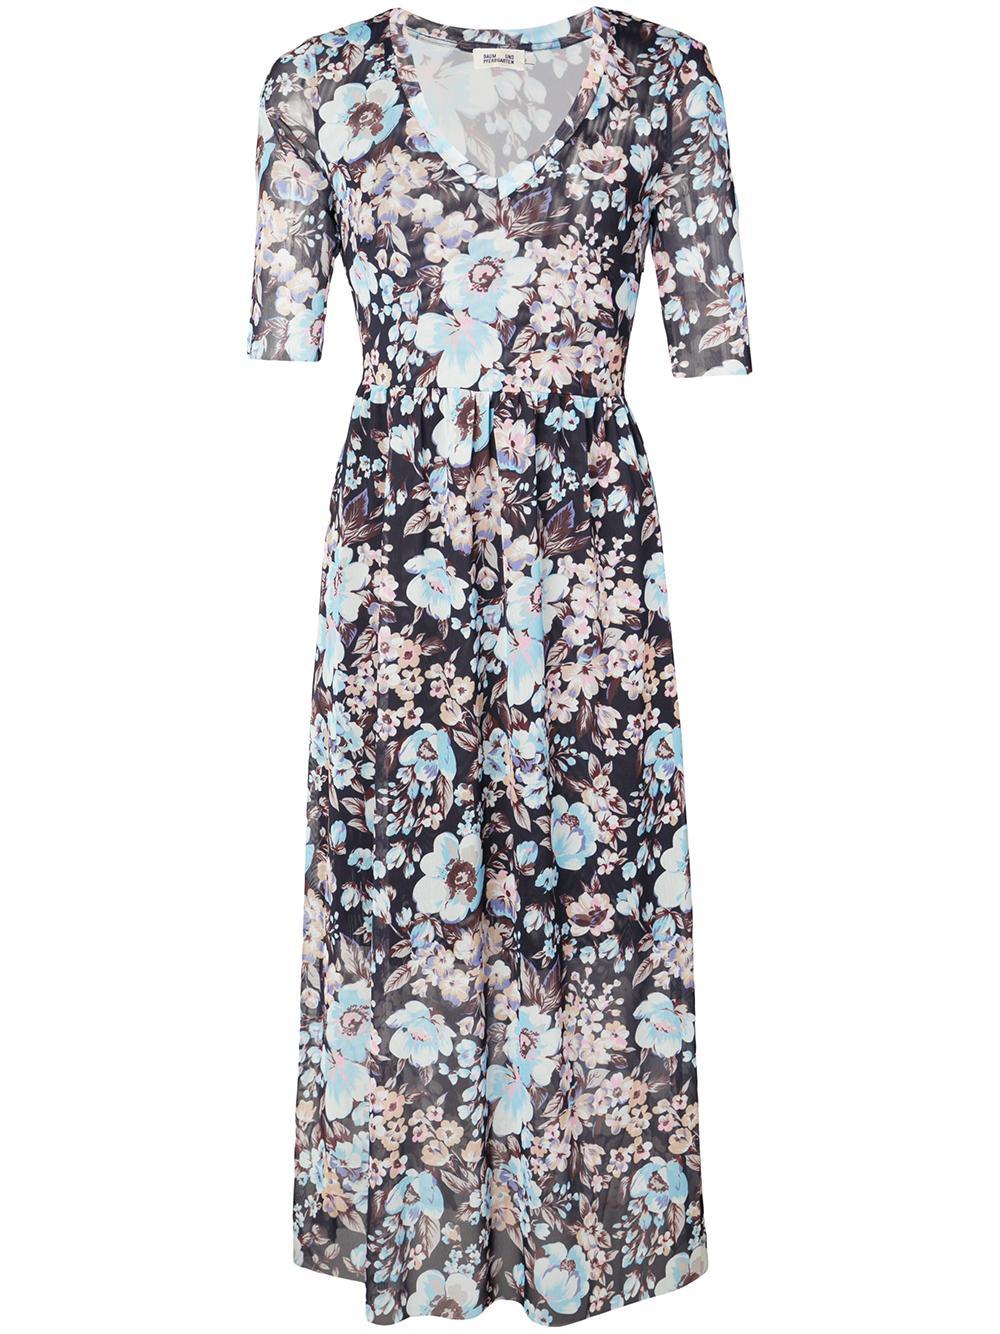 Janeth Floral Print 3/4 Sleeve Maxi Dress Item # 20517